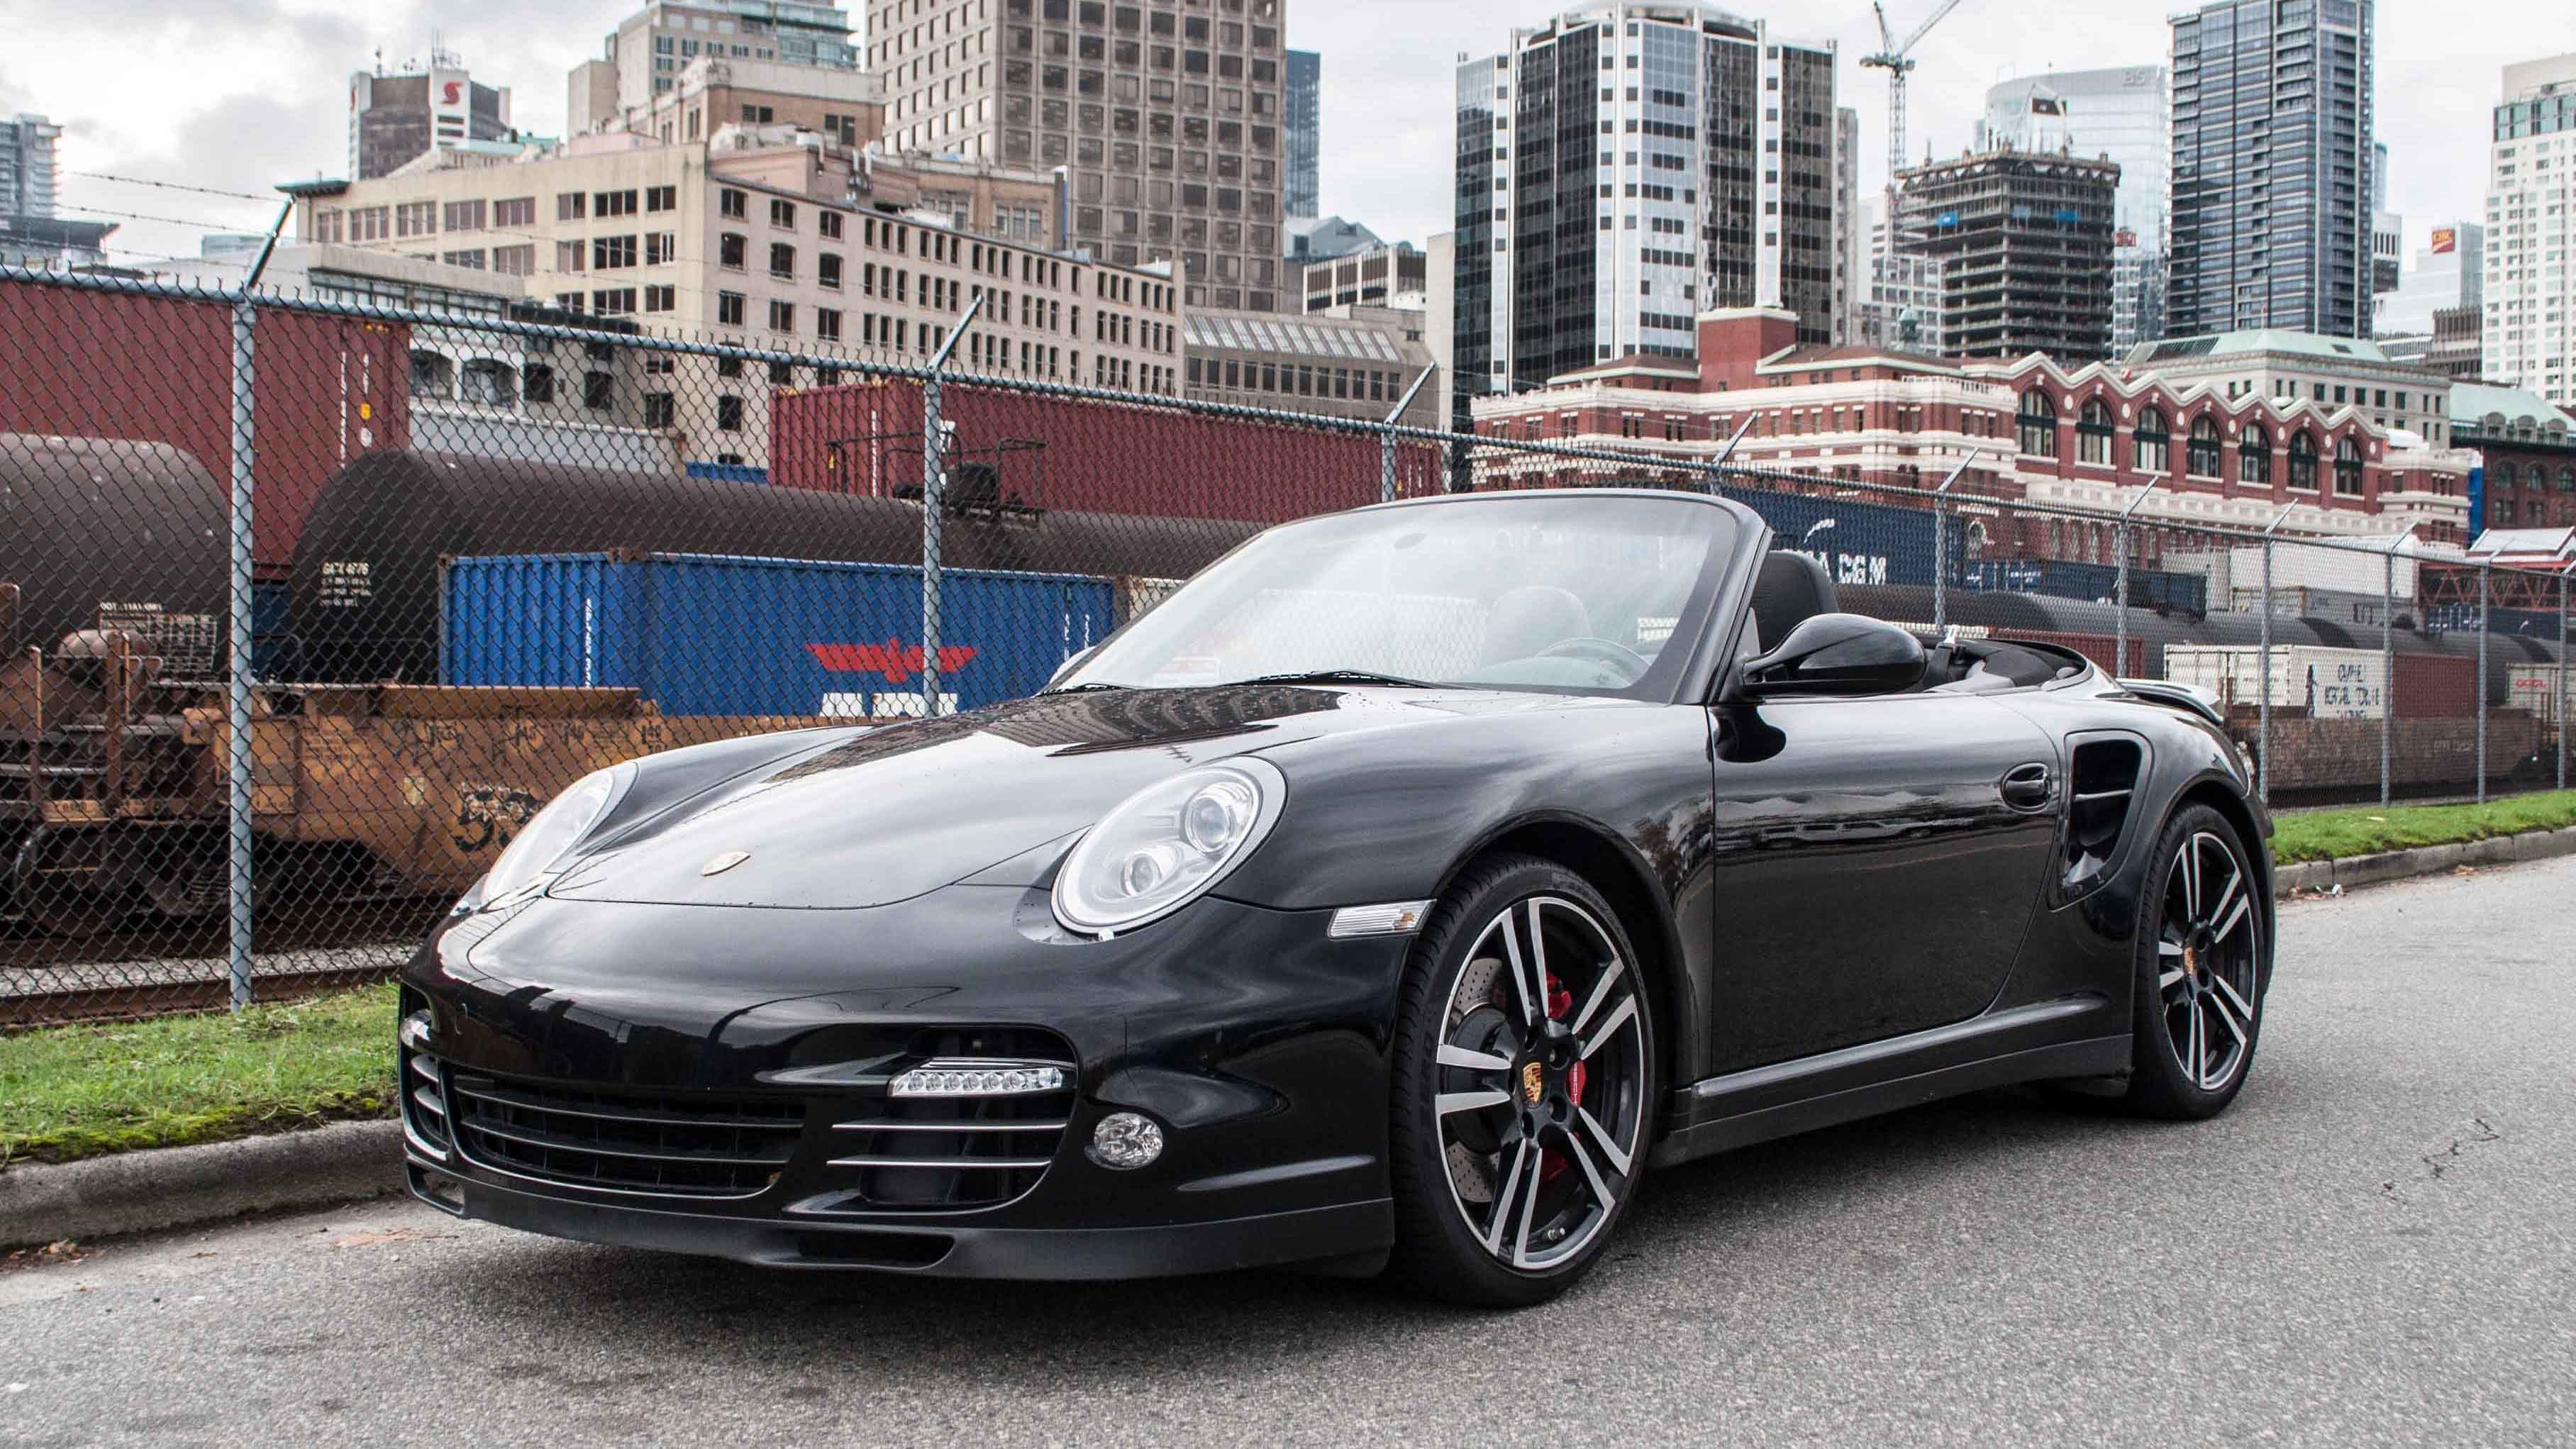 3676 5b411592c1c12011 porsche 911 turbo vancouver autoform12